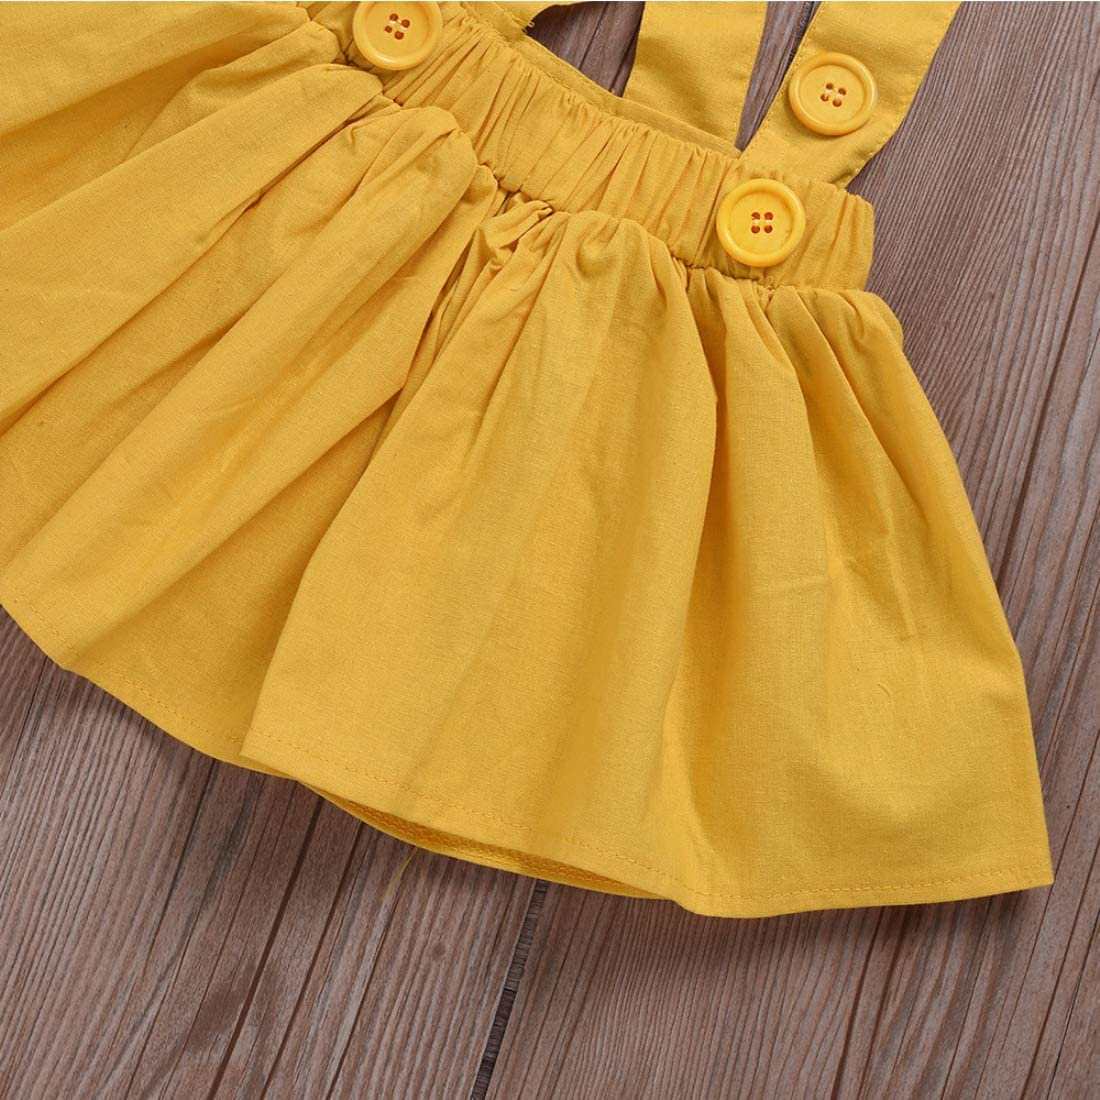 Toddler Baby Kid Girls Dress Polka Dot Ruffle Sleeve Bowknot Shirt Suspender Skirt with Headband 3 PCs Outfits Sets